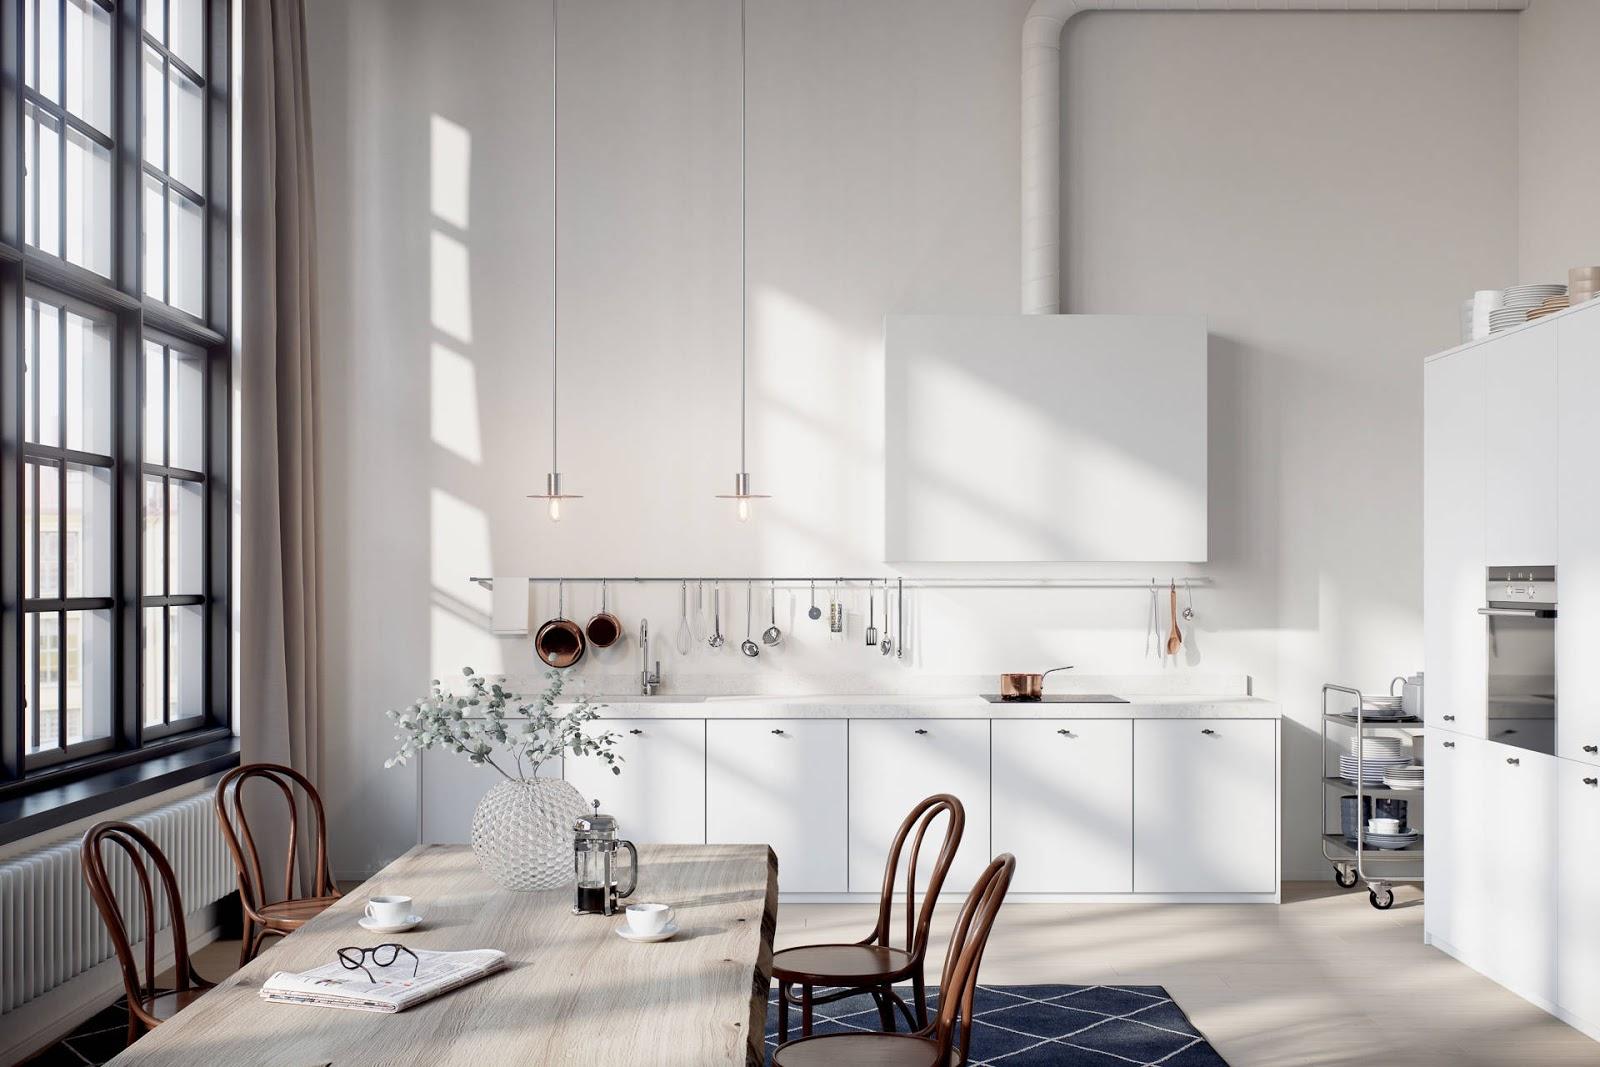 Converted industrial building - kitchen interior